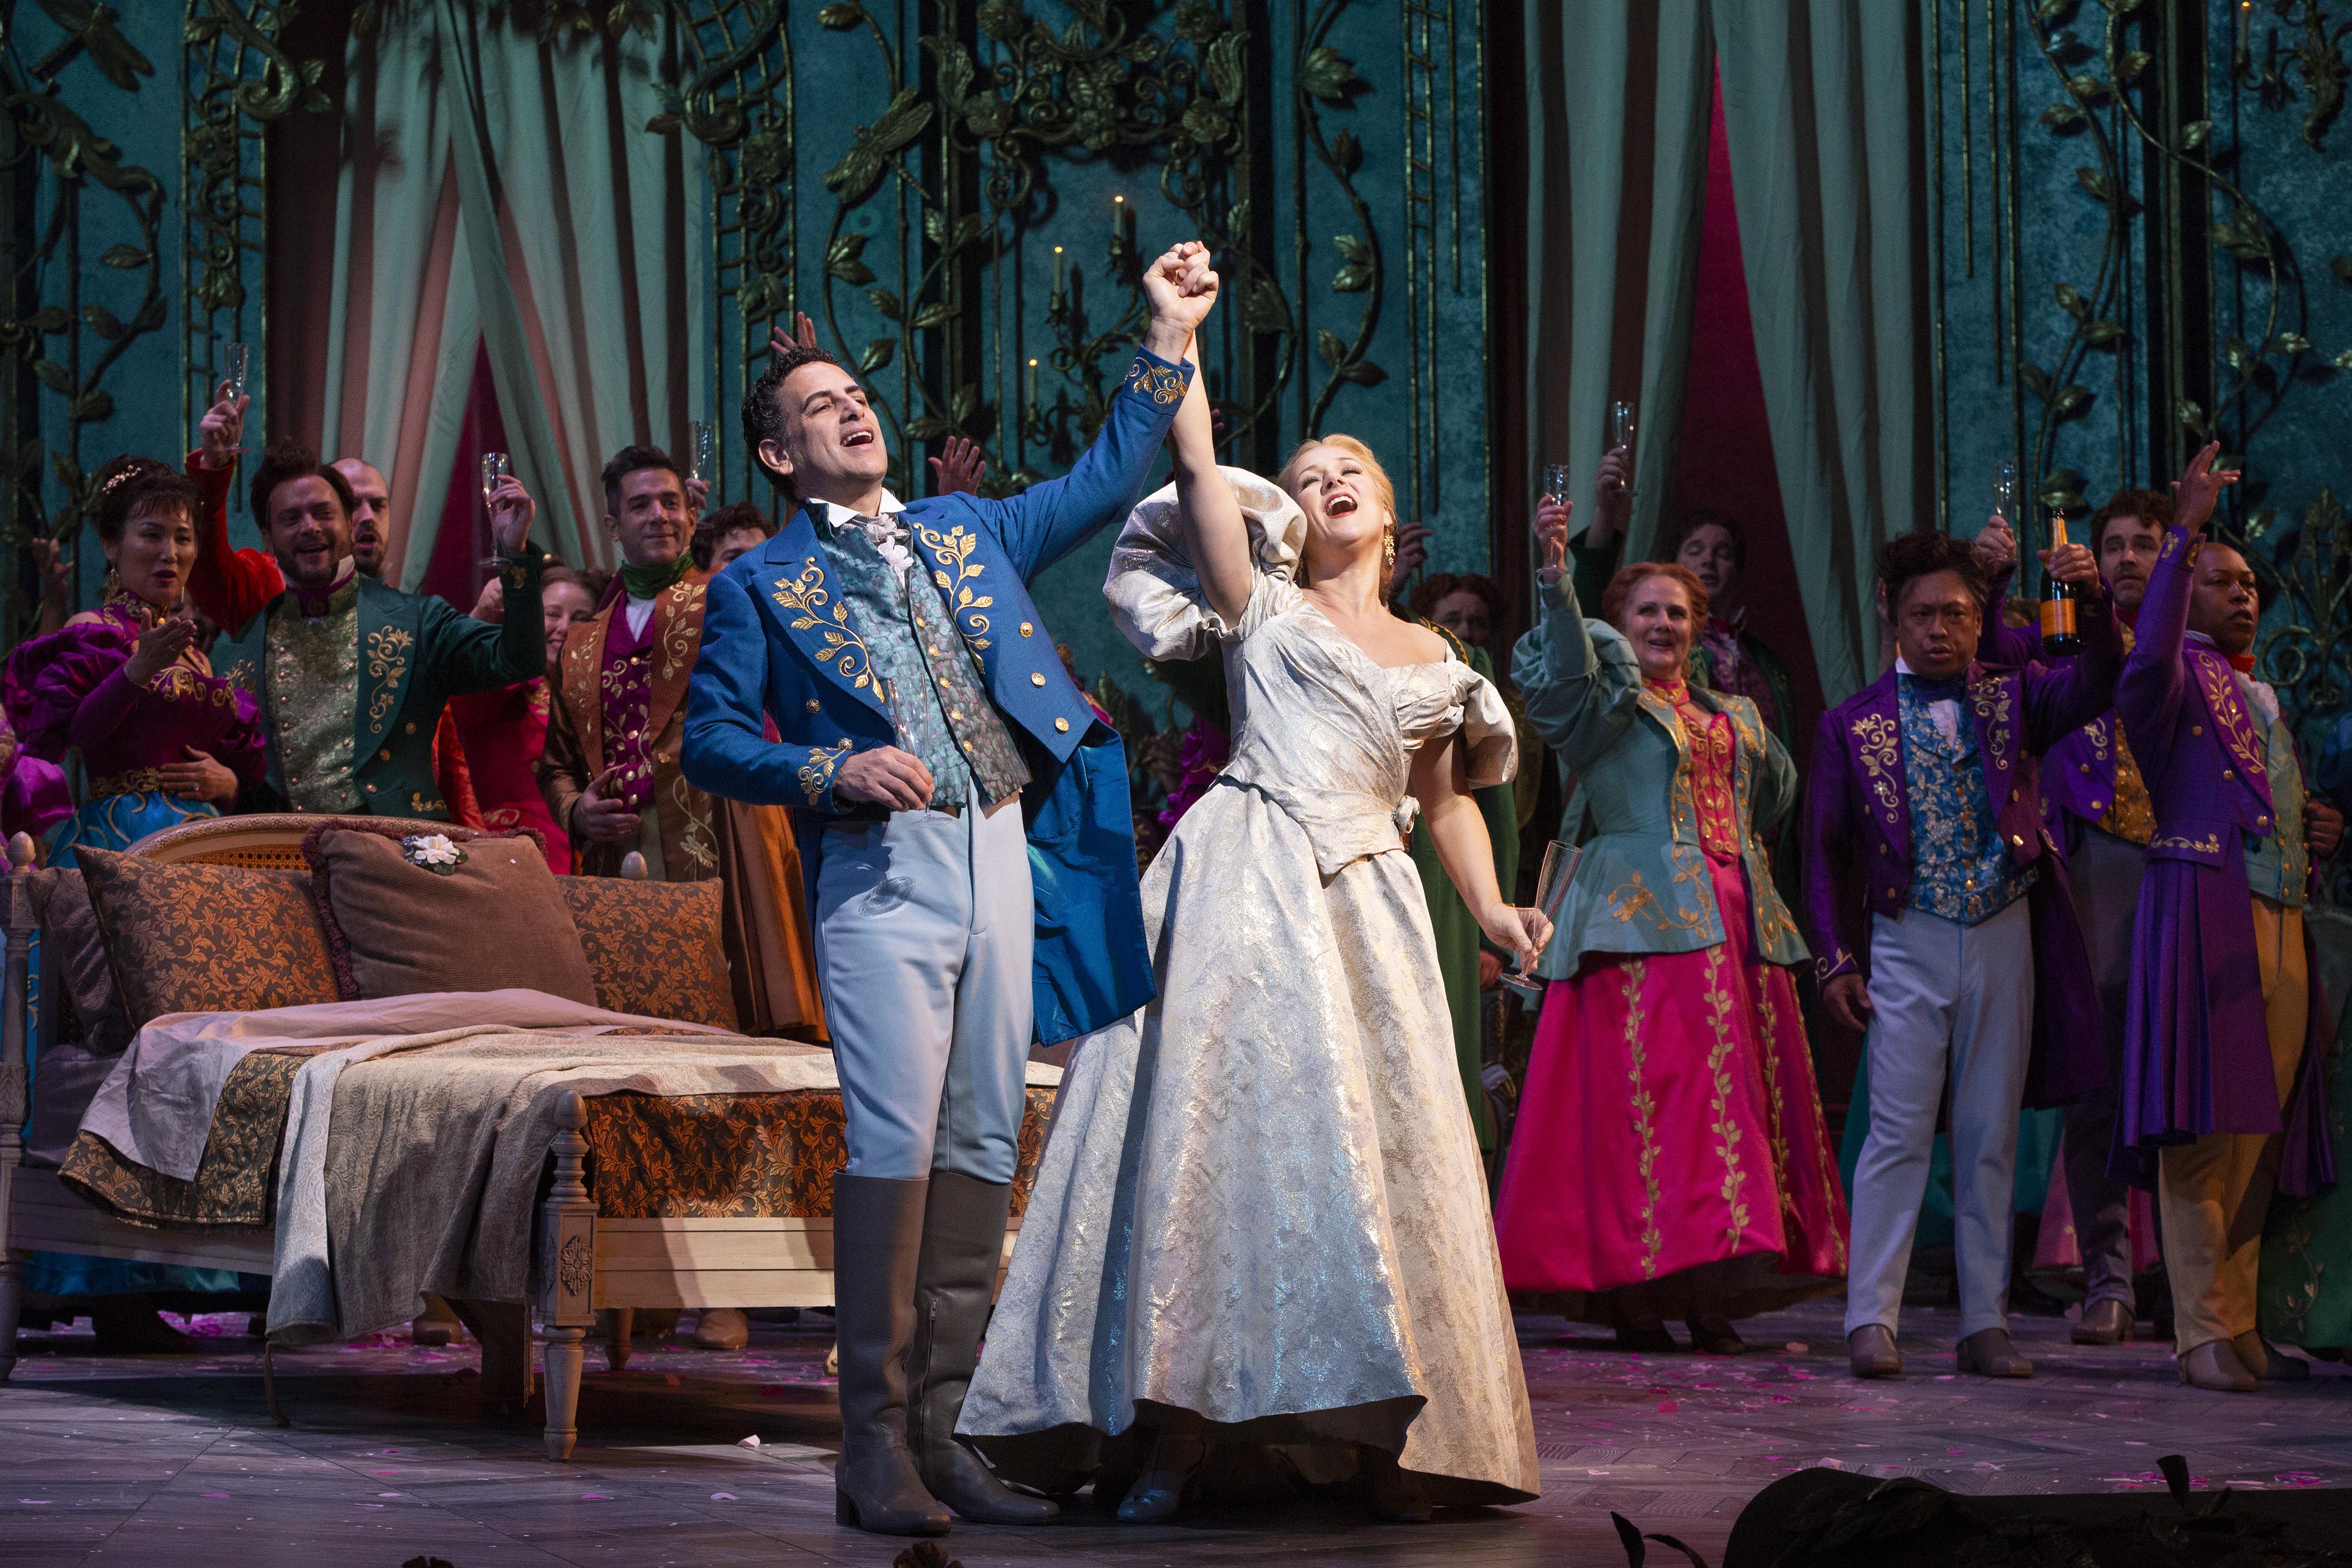 Metropolitan Opera, After Shutting Its Doors, Will Offer Free ...